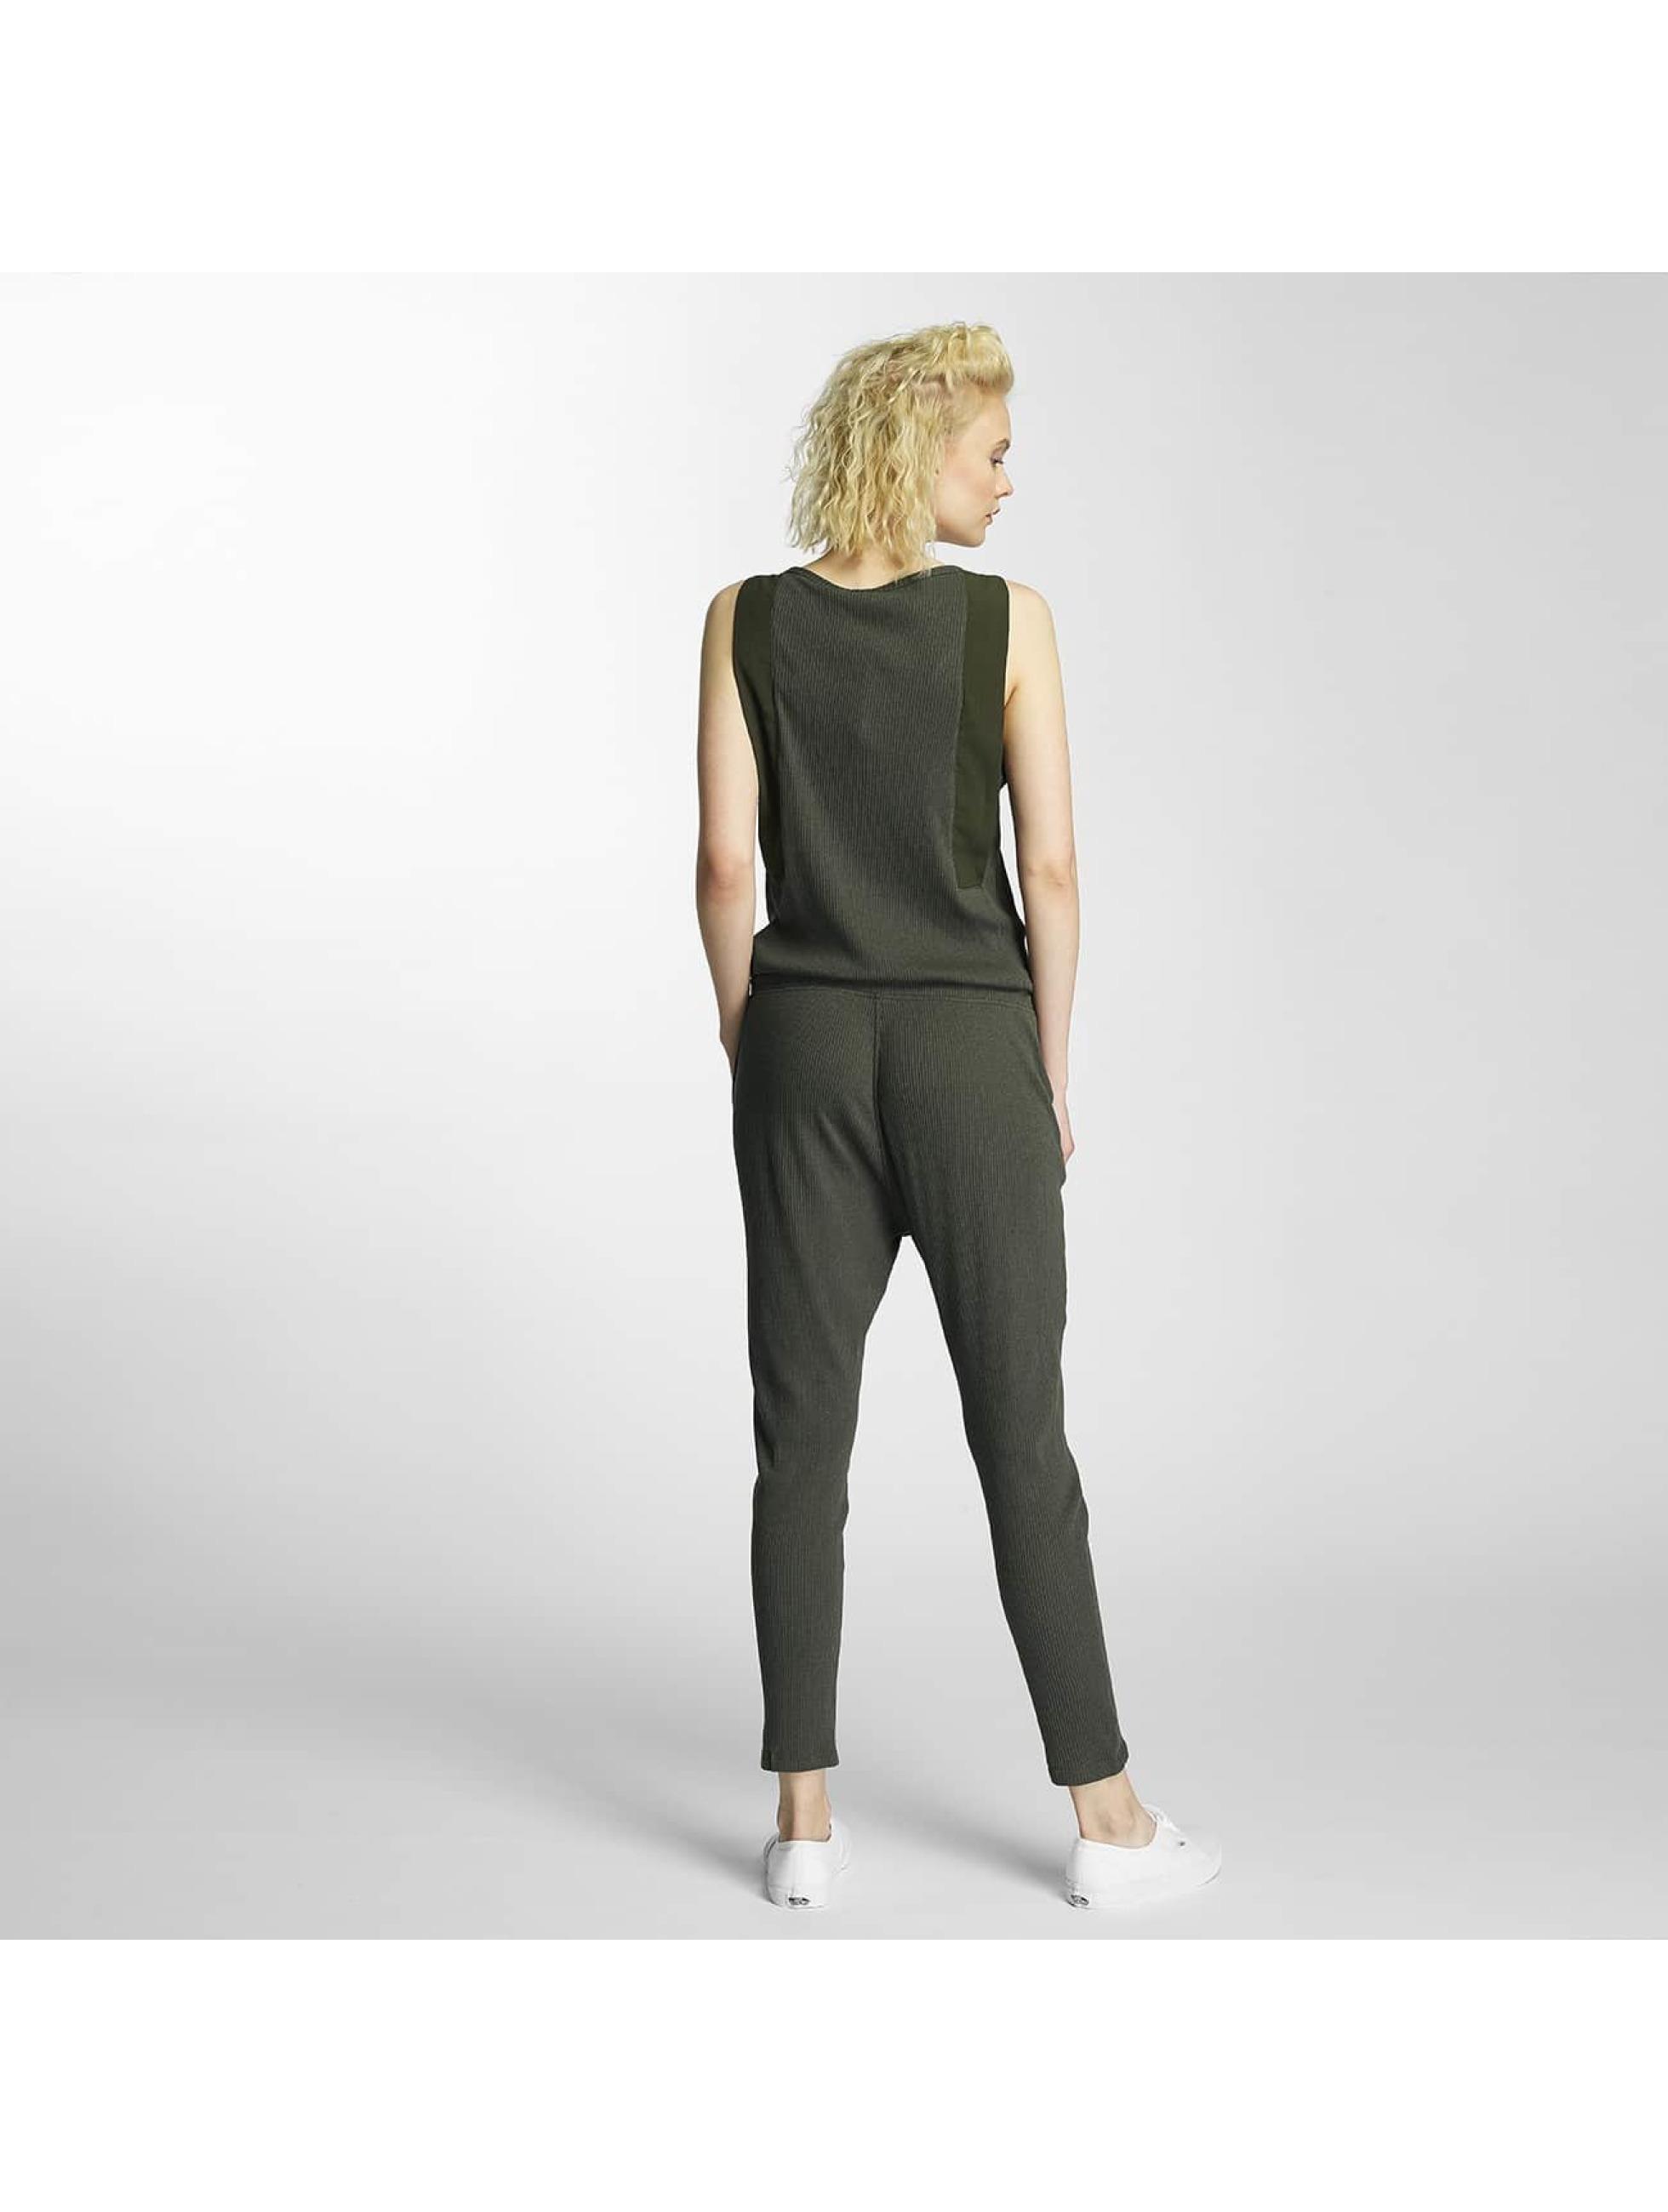 g star jumpsuit lyker bosavi in groen 330779. Black Bedroom Furniture Sets. Home Design Ideas